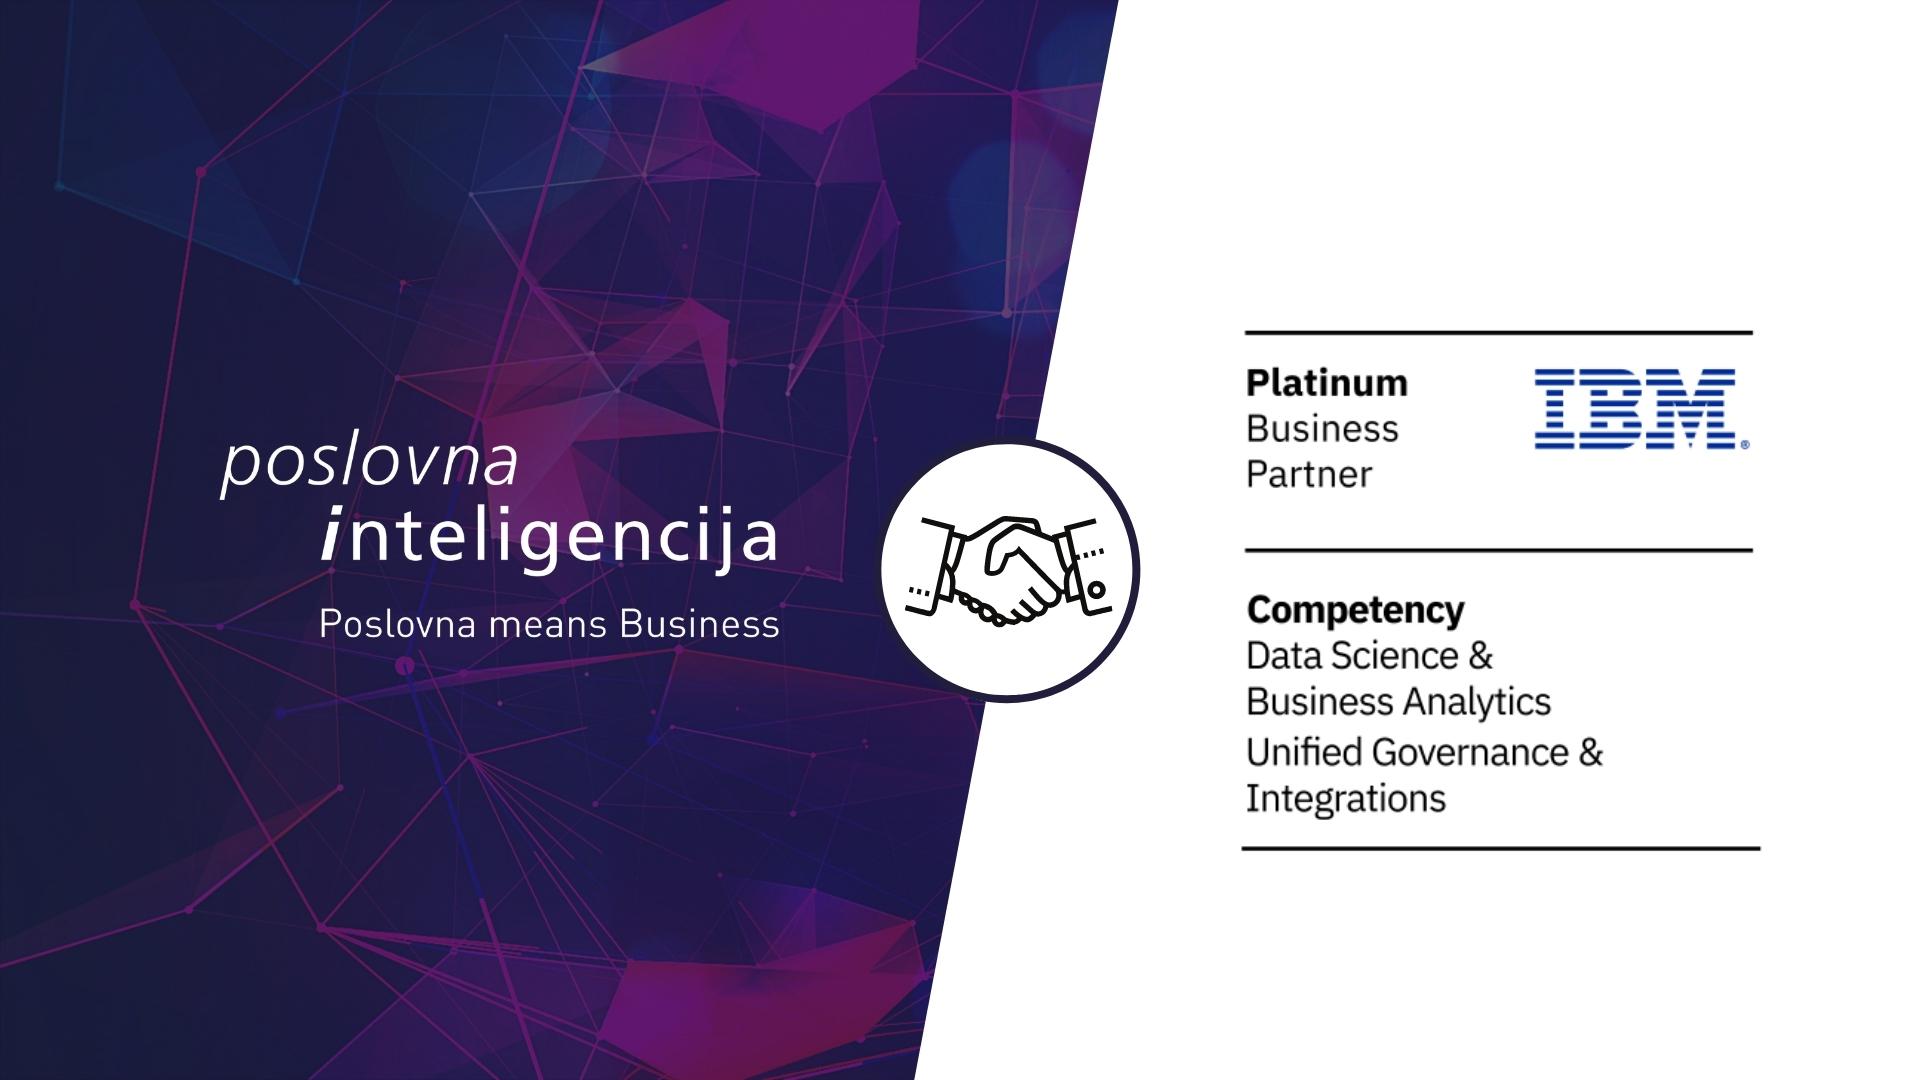 IBM Poslovna inteligencija-Platinum partner